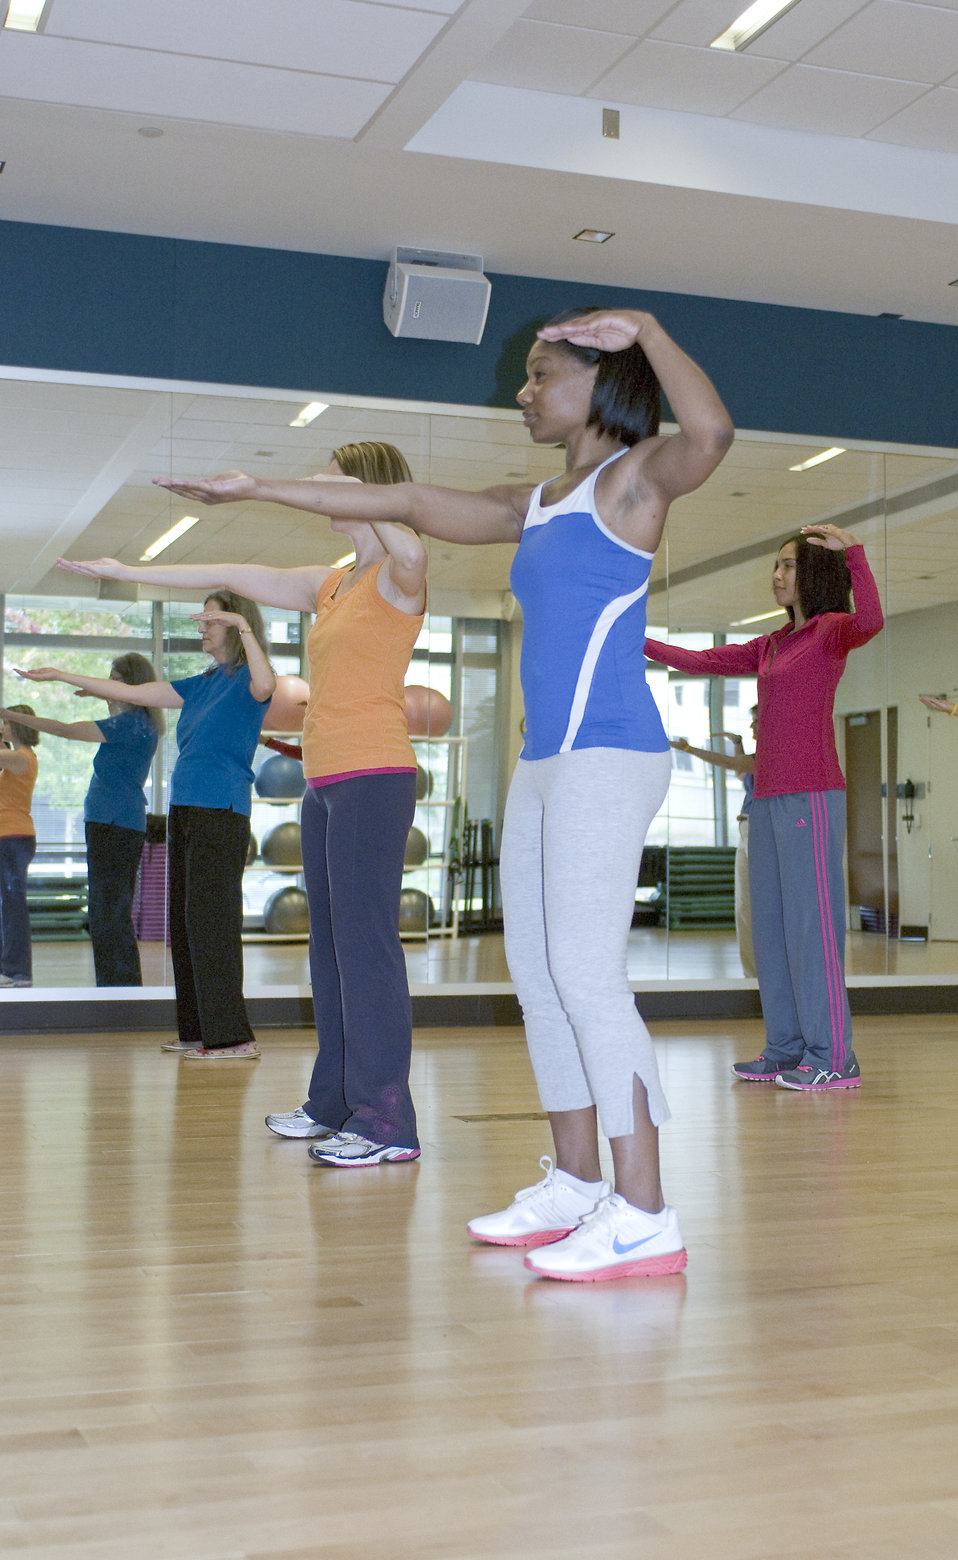 A group of women doing aerobics : Free Stock Photo